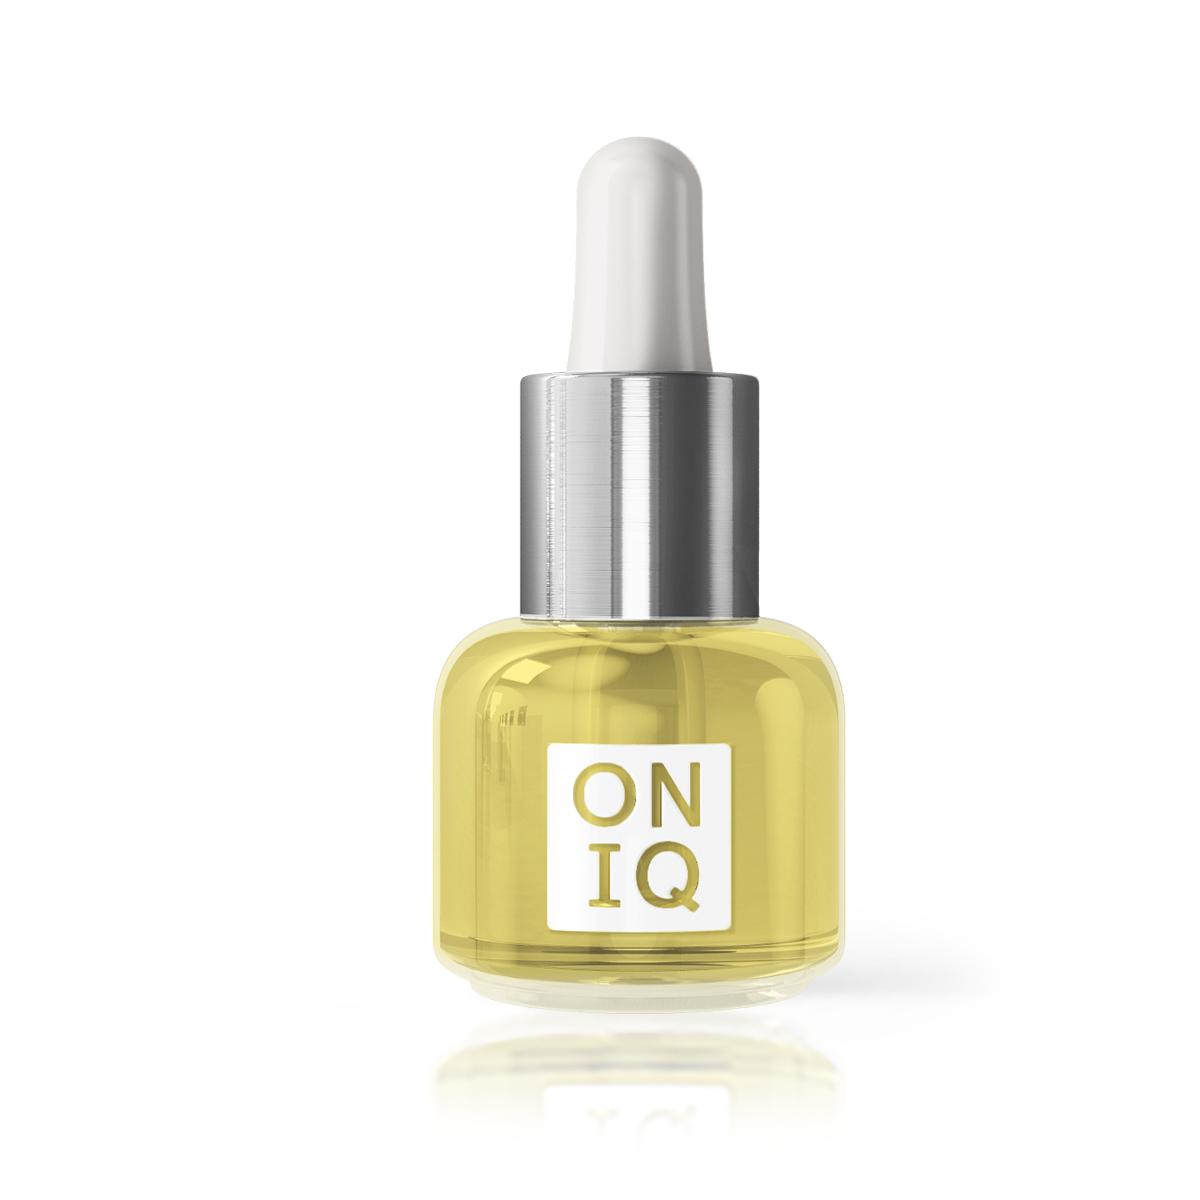 ONIQ Масло для кутикулы с ароматом банана 15 мл - Для кутикулы